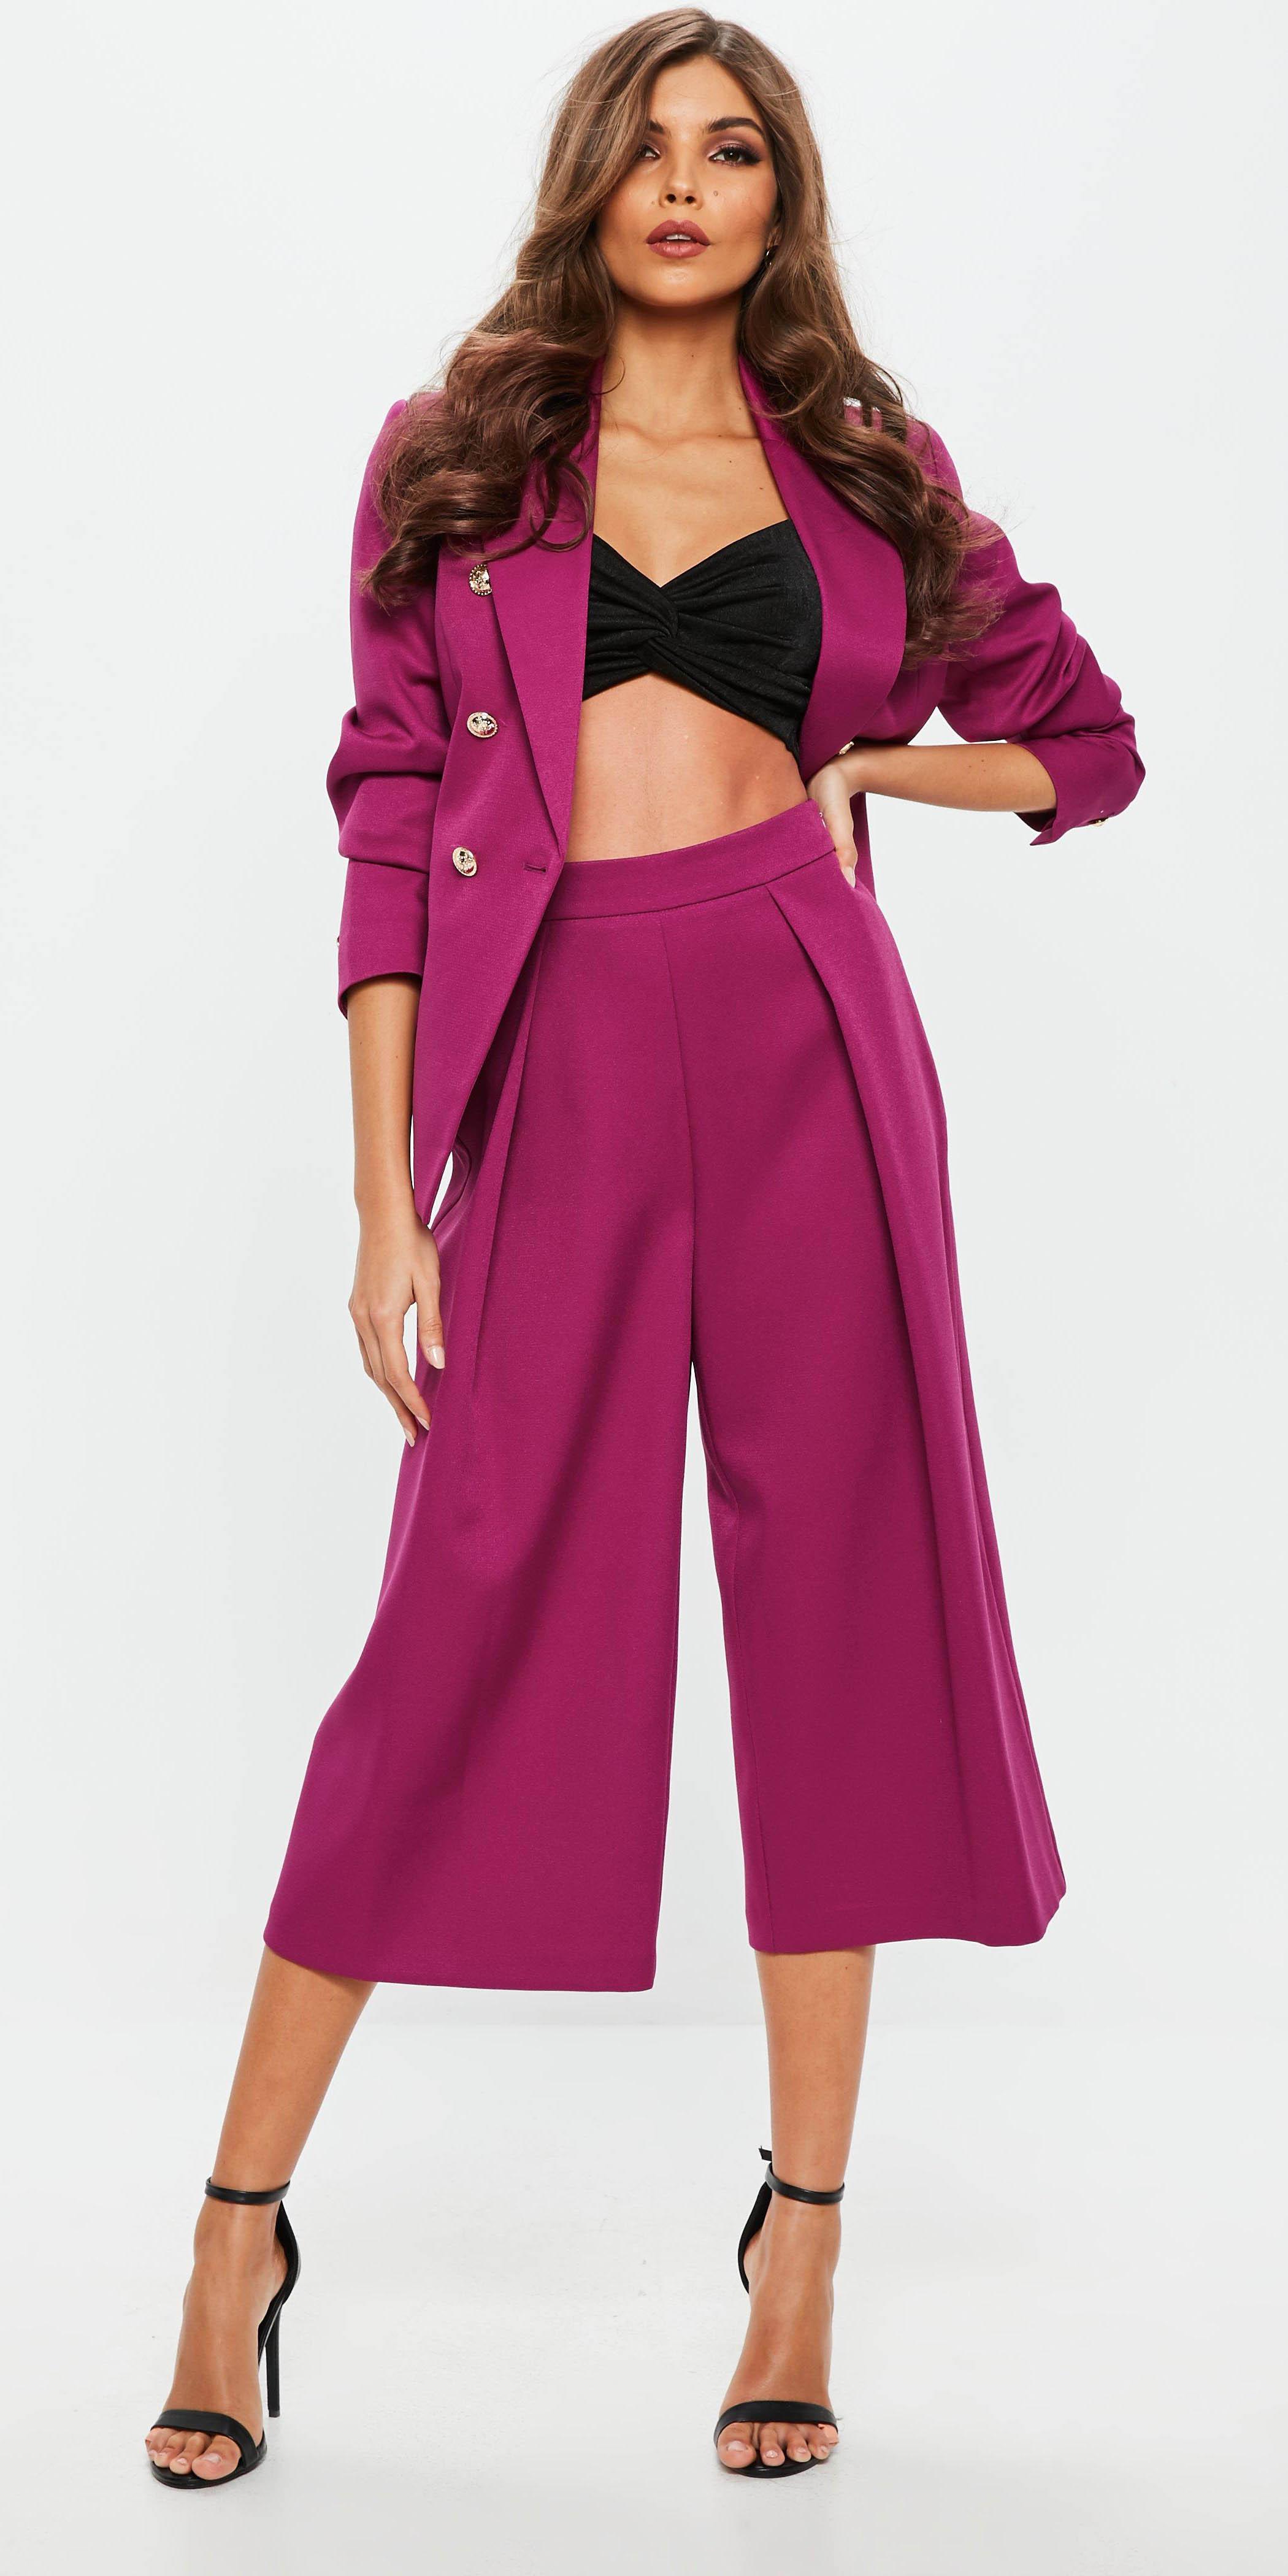 pink-magenta-culottes-pants-pink-magenta-jacket-blazer-suit-black-crop-top-hairr-black-shoe-sandalh-spring-summer-dinner.jpg